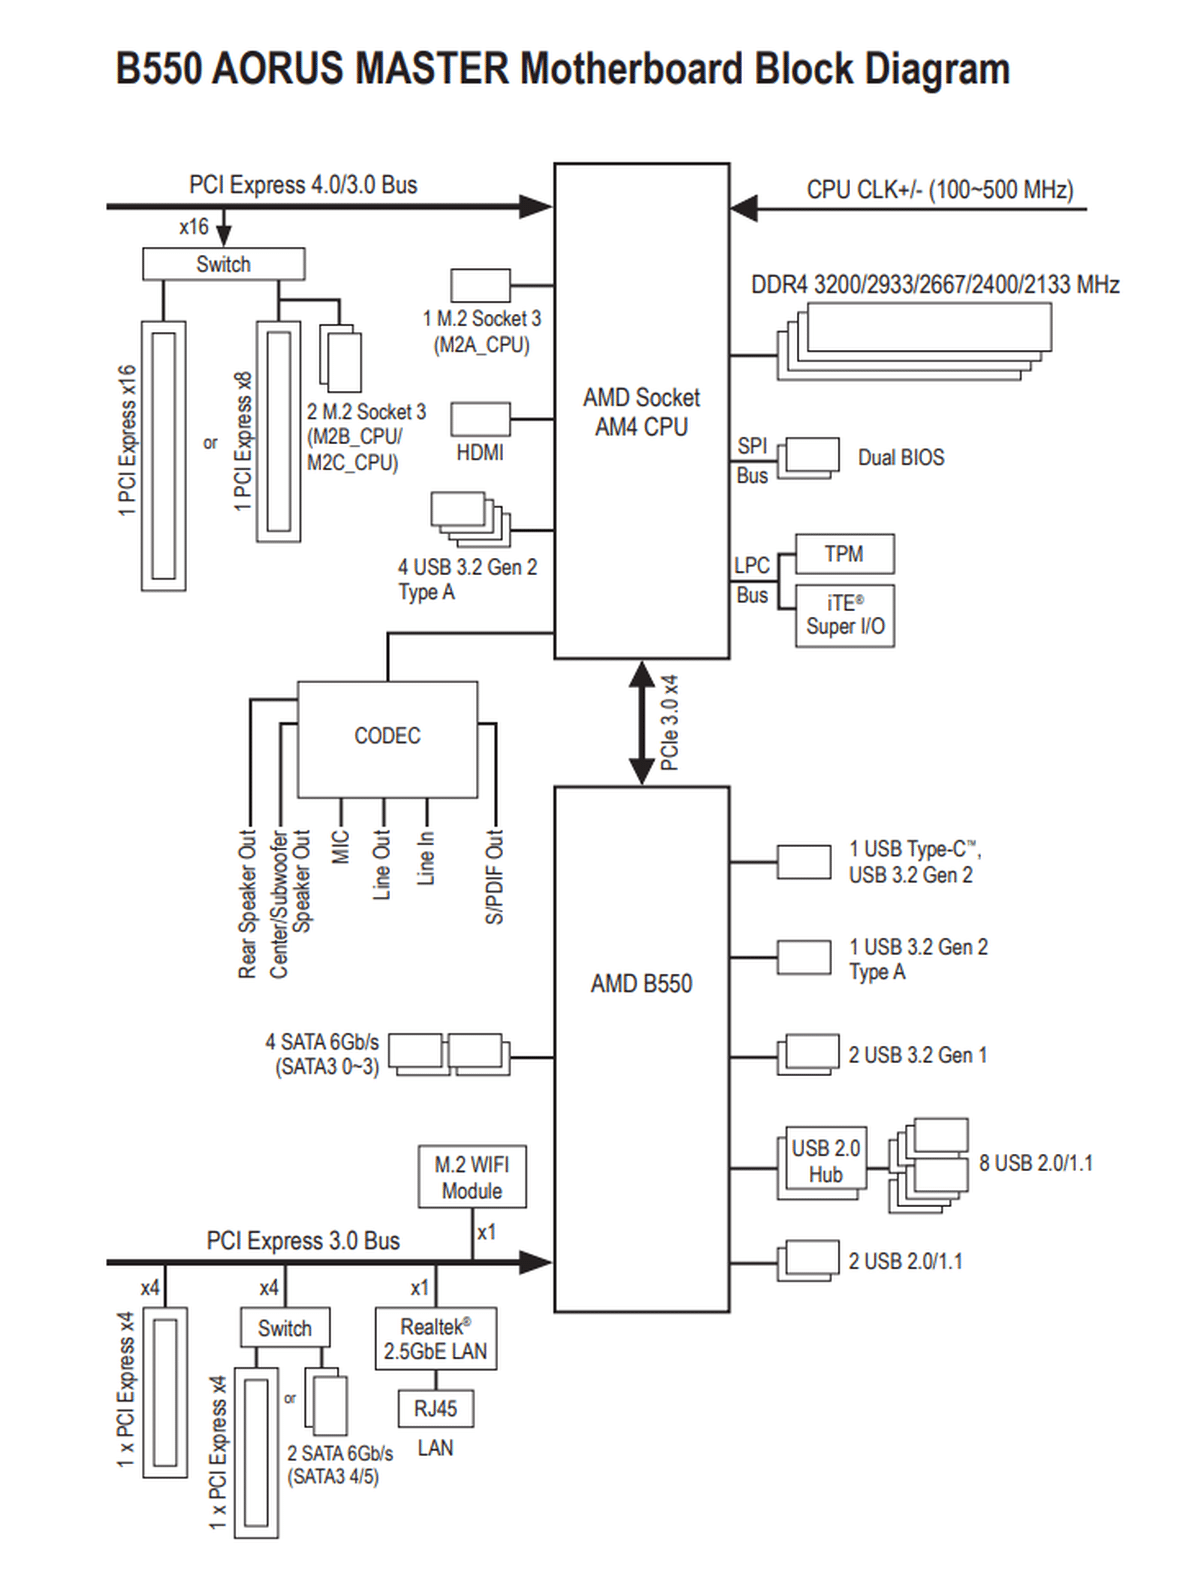 Diagramme B550 AORUS MASTER